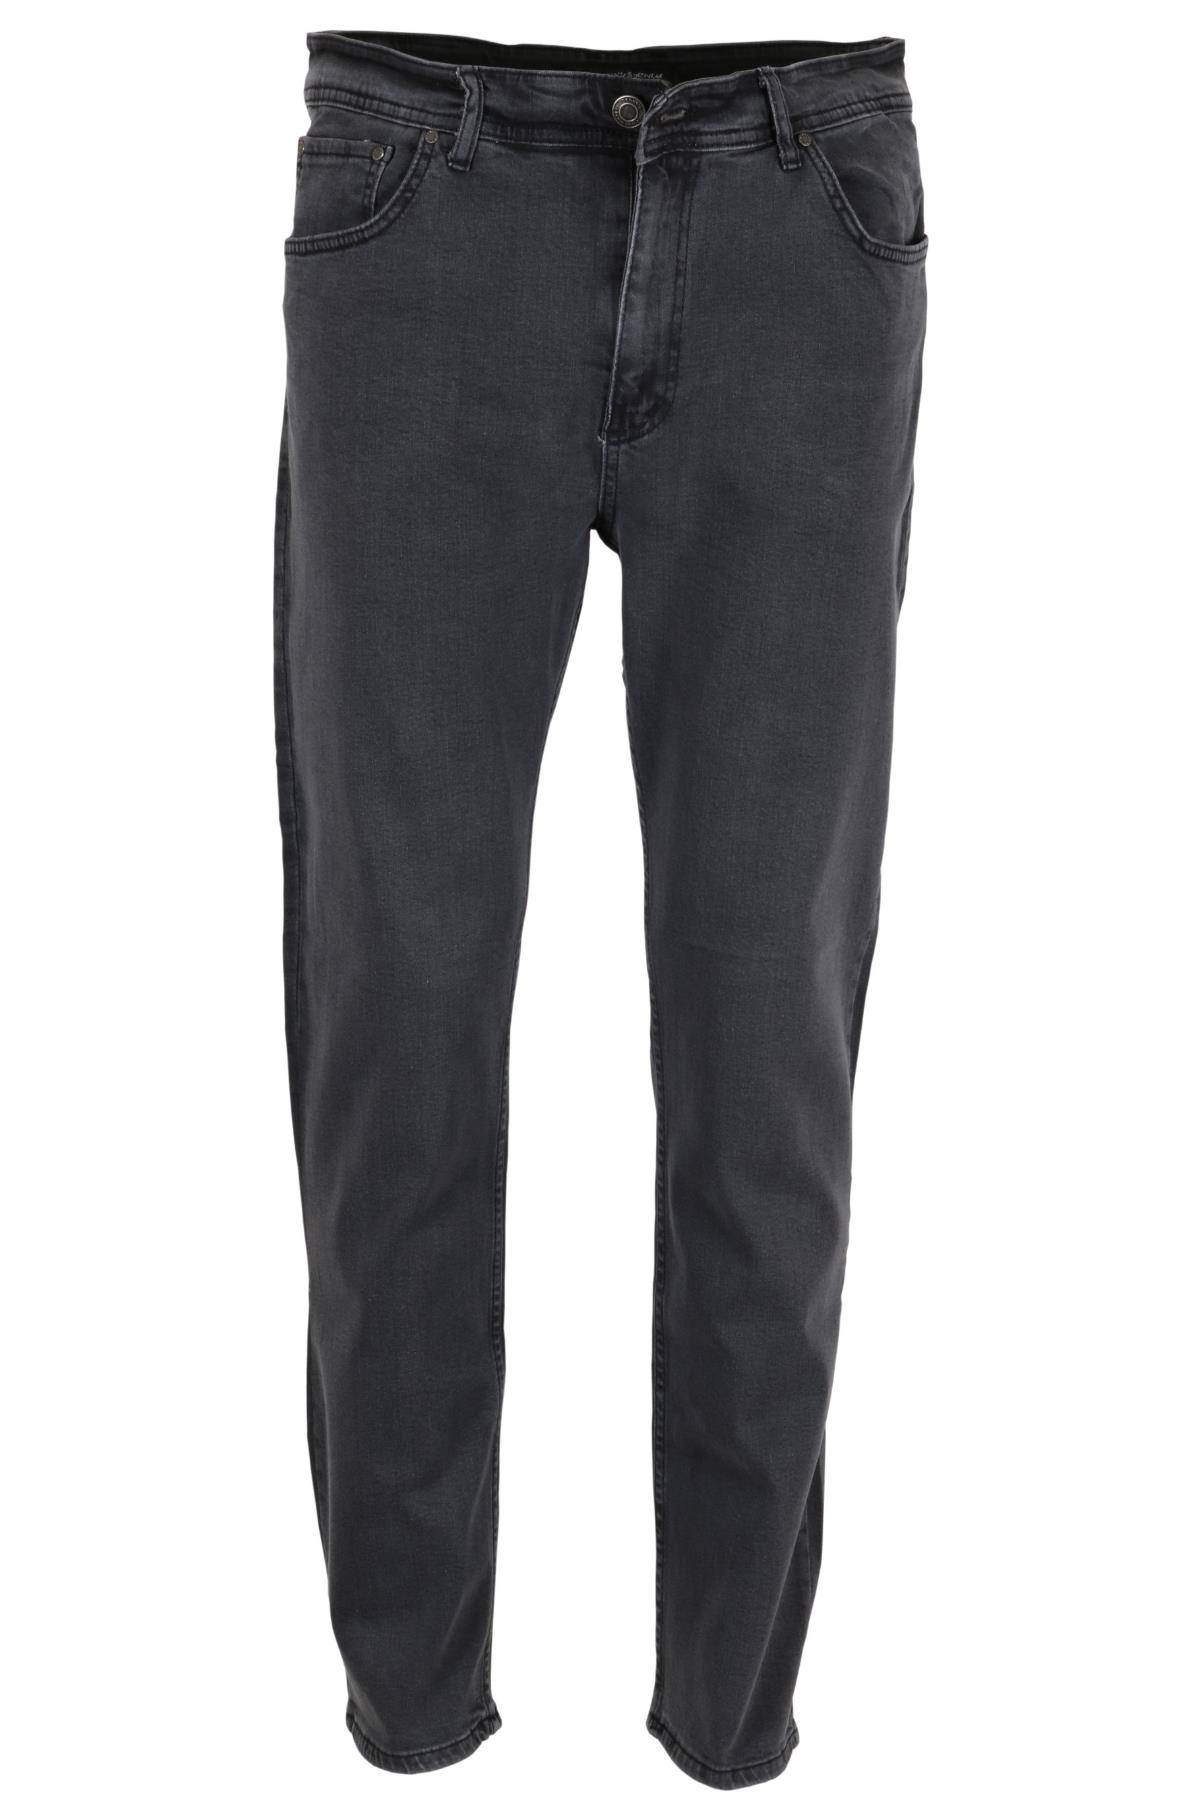 Erkek Battal Kot Pantolon Normal Kesim RAR00462